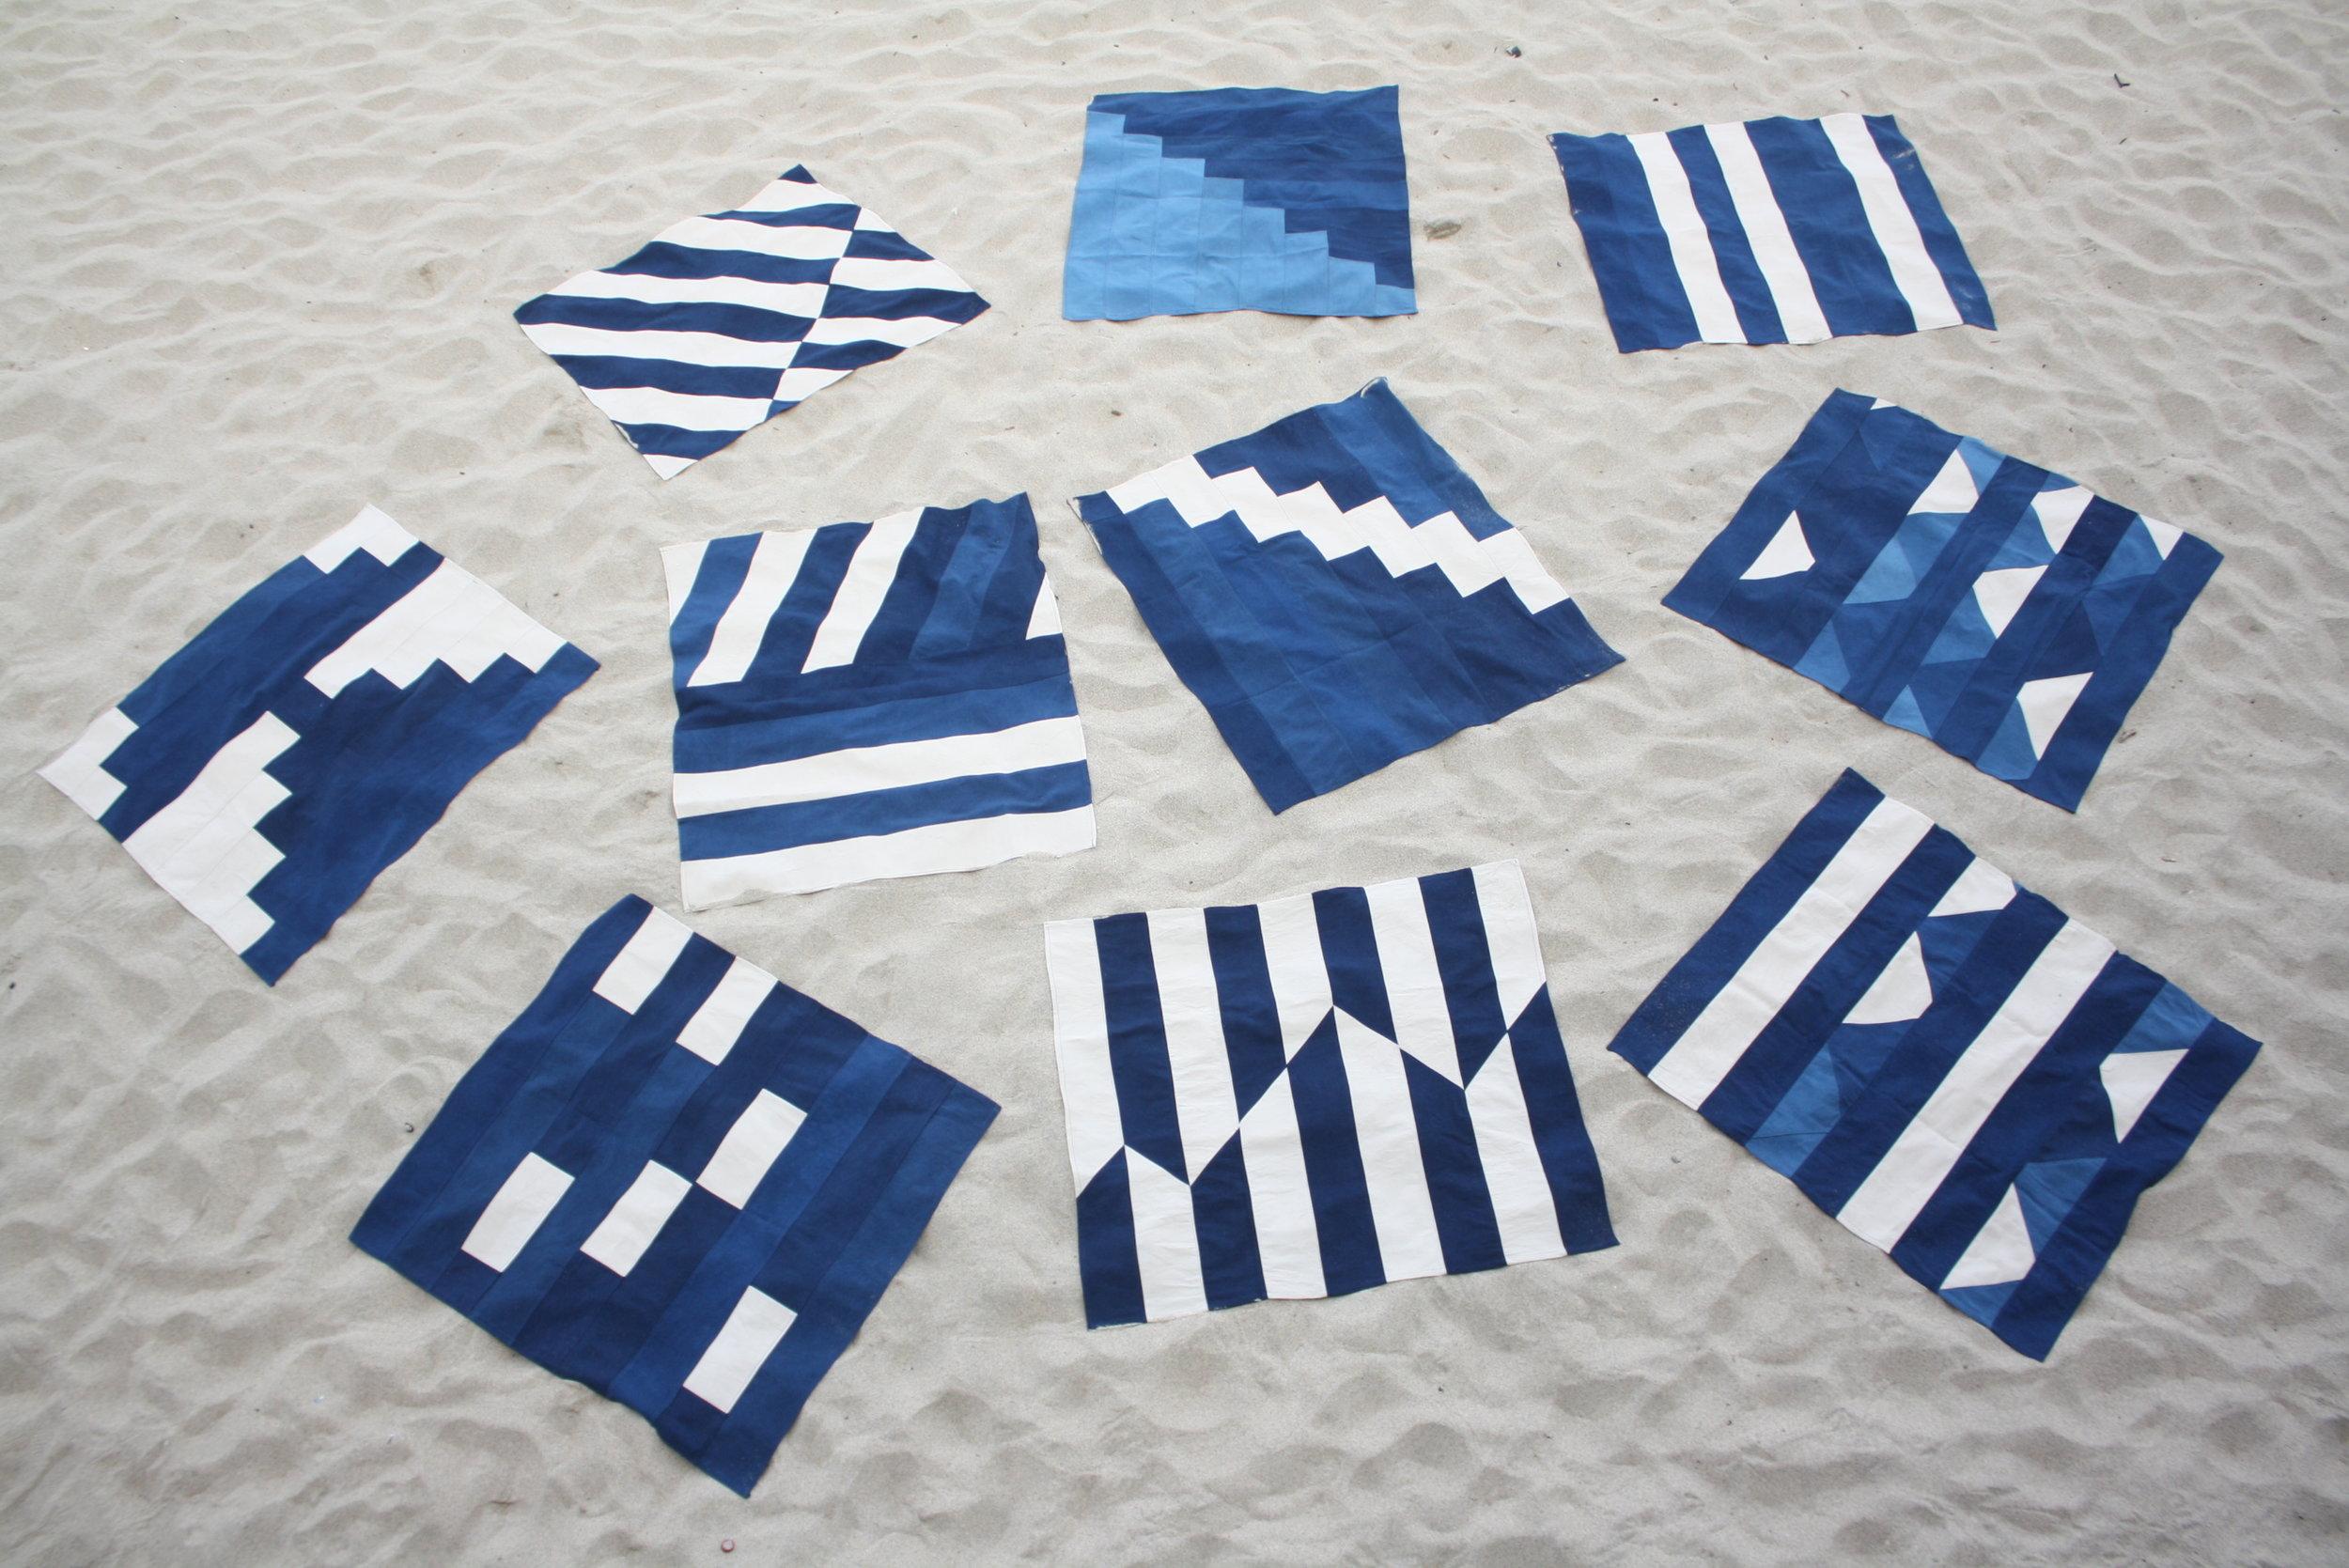 sarah johnson cabbage blue indigo clothing cast cornwall folklore serpentine porthmeor beach mats